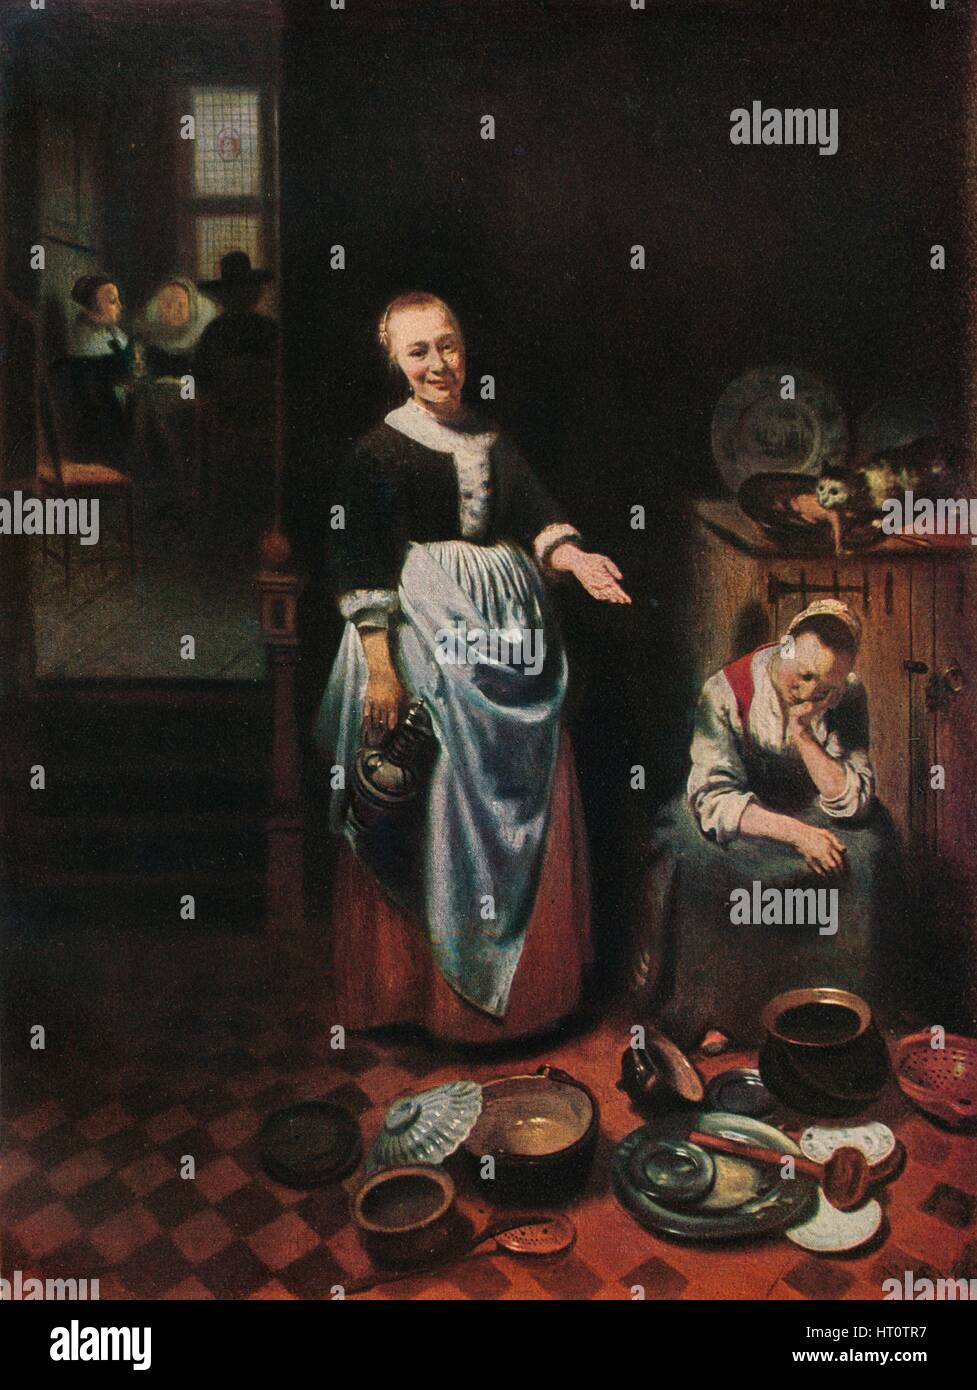 'The Idle Servant', 1655. Artist: Nicolaes Maes. - Stock Image